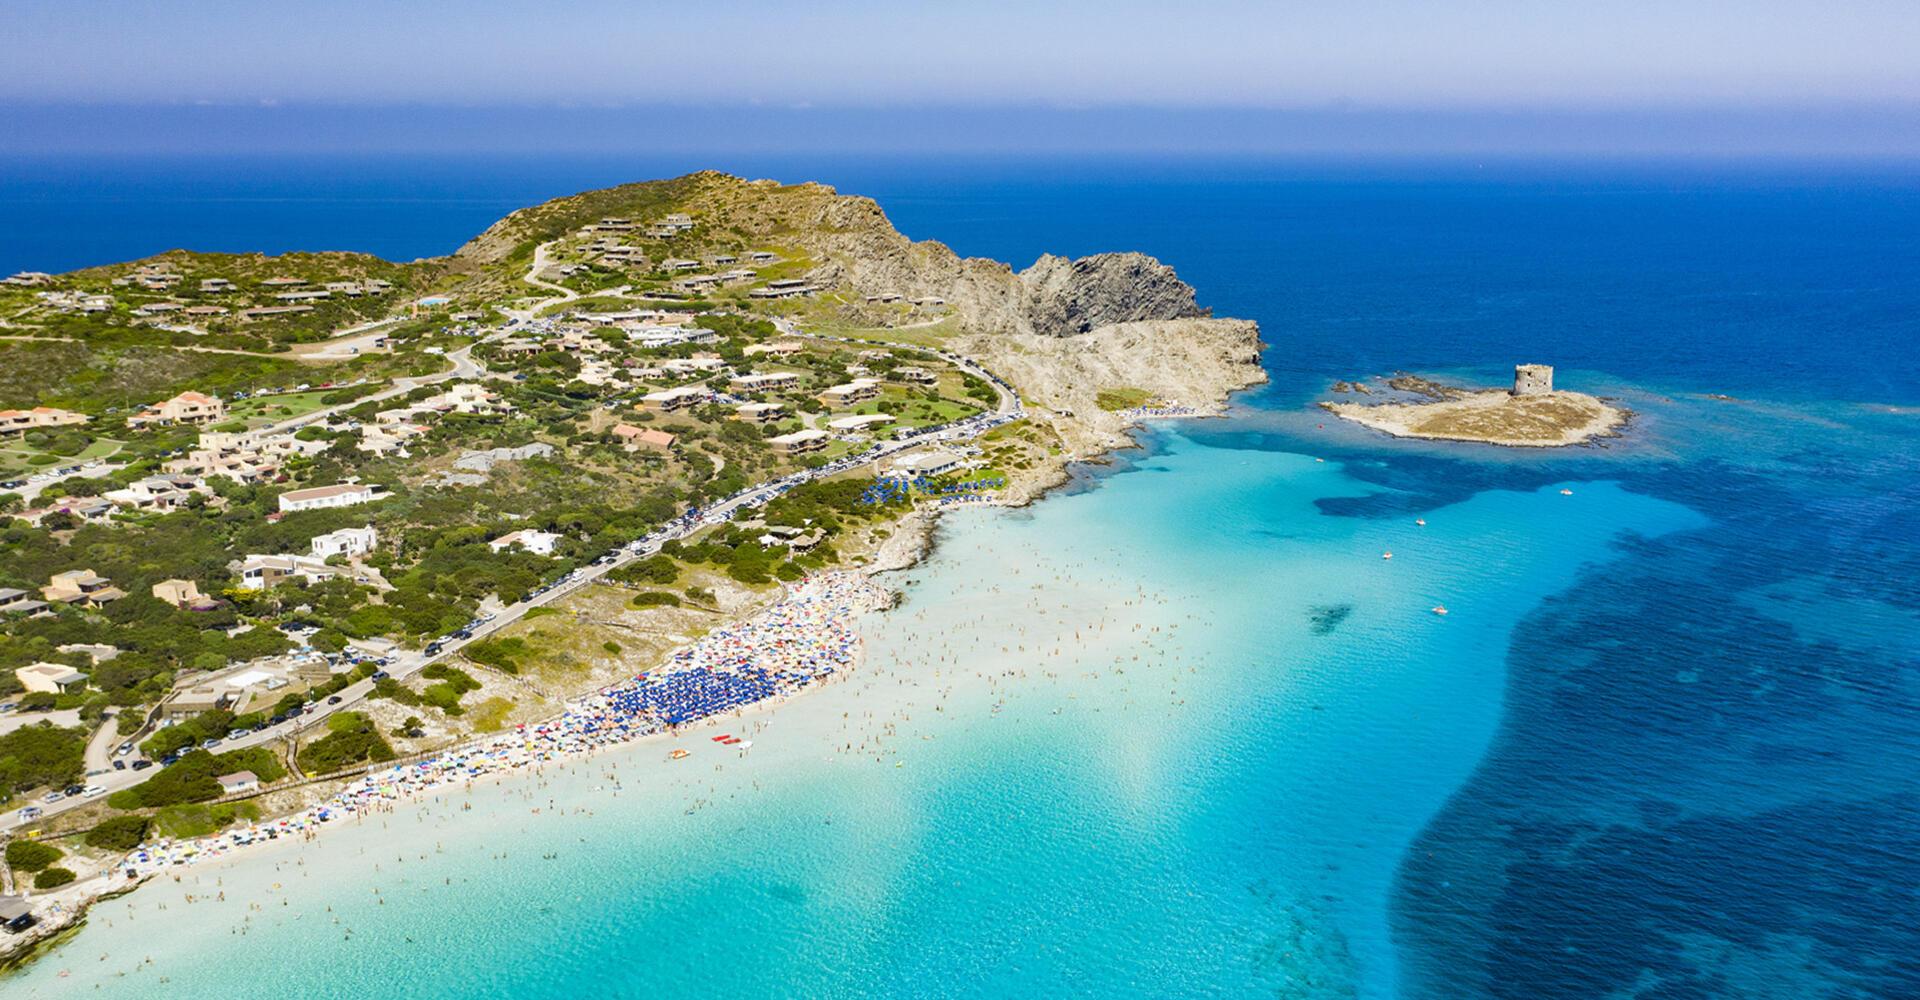 8 Tage Sonneninsel Ischia im Hotel Tritone Resort & Spa - Vitaliamo